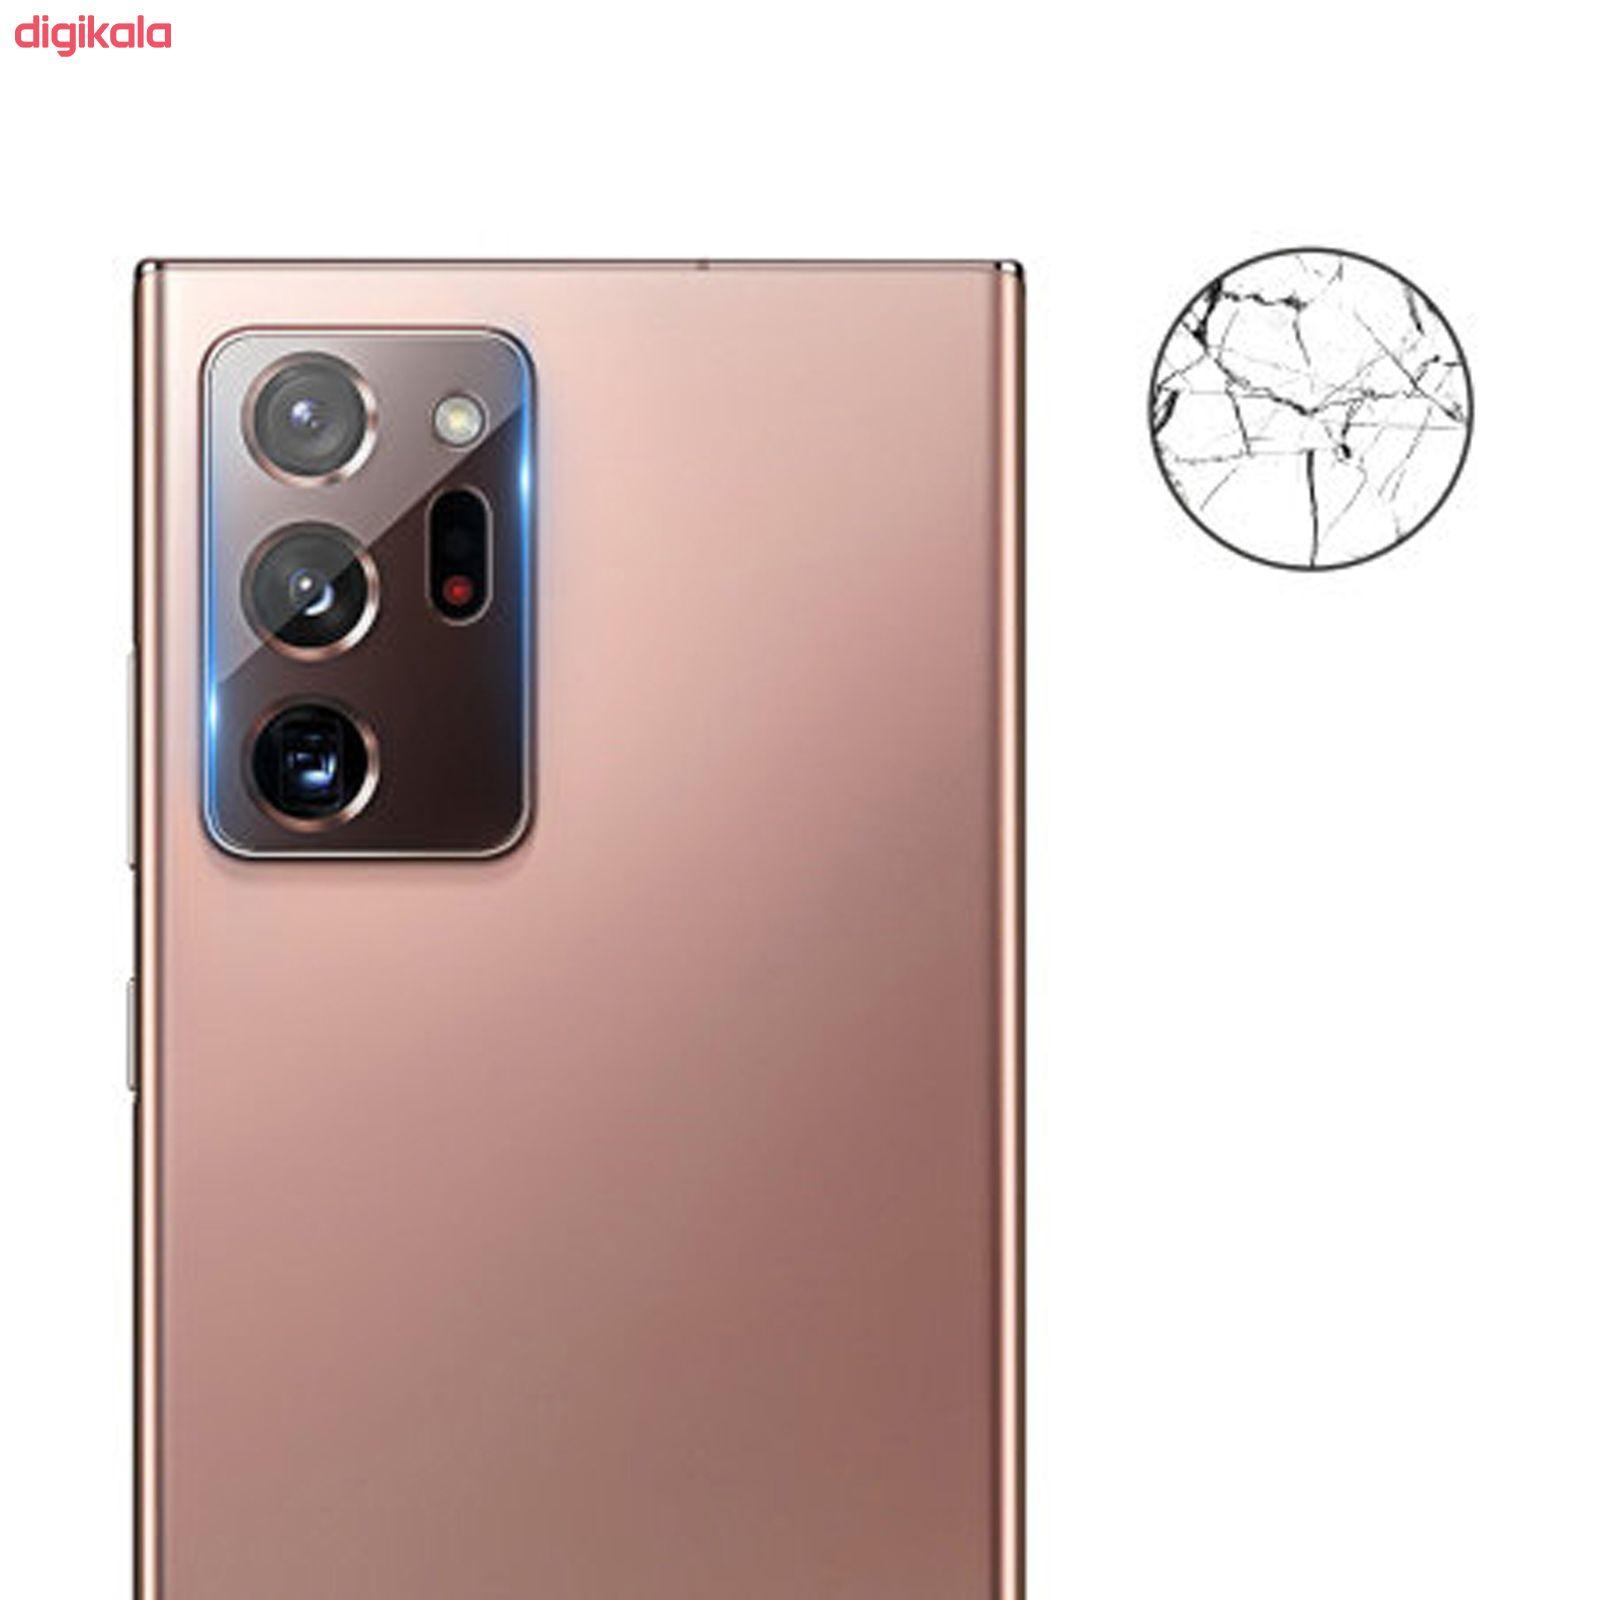 محافظ لنز دوربین سیحان مدل GLP مناسب برای گوشی موبایل سامسونگ Galaxy Note 20 Ultra main 1 2